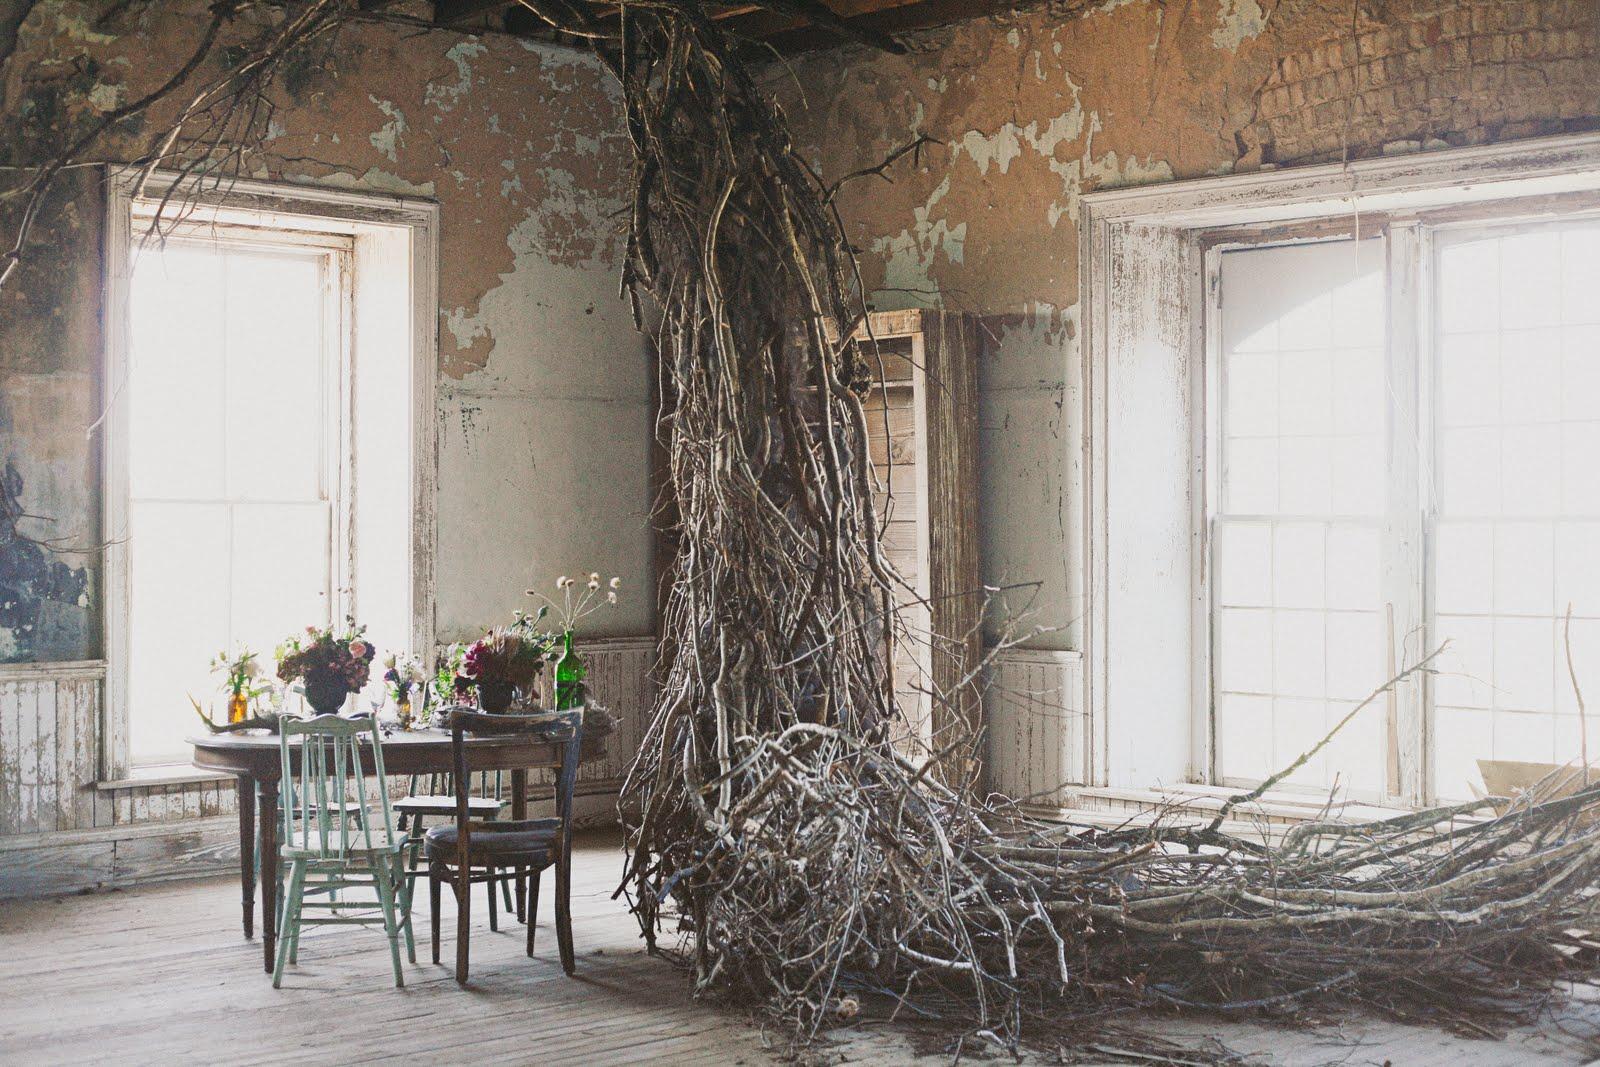 botanical_noir shoot_apryl ann_rent my dust_vintage rental (4).jpg